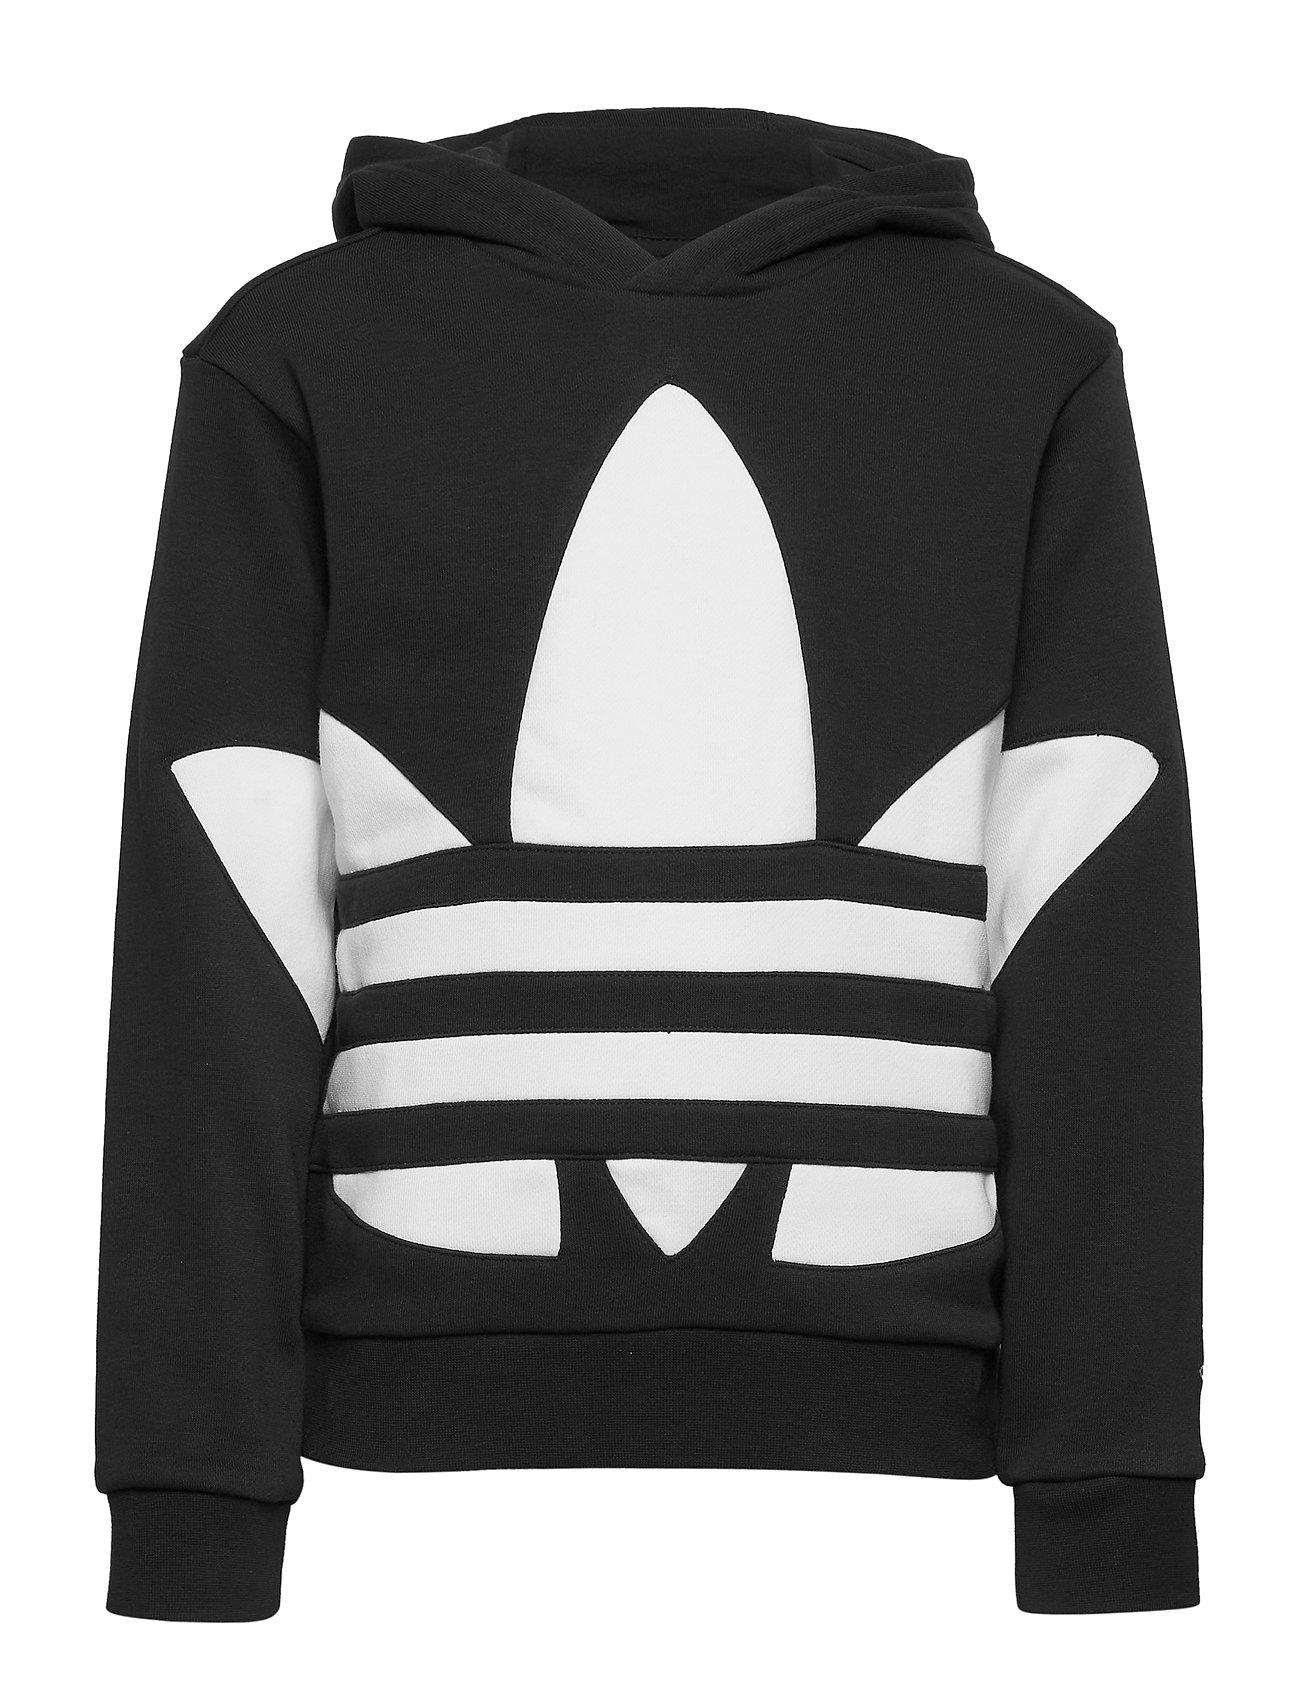 adidas Originals BG TREFOIL HOOD - BLACK/WHITE